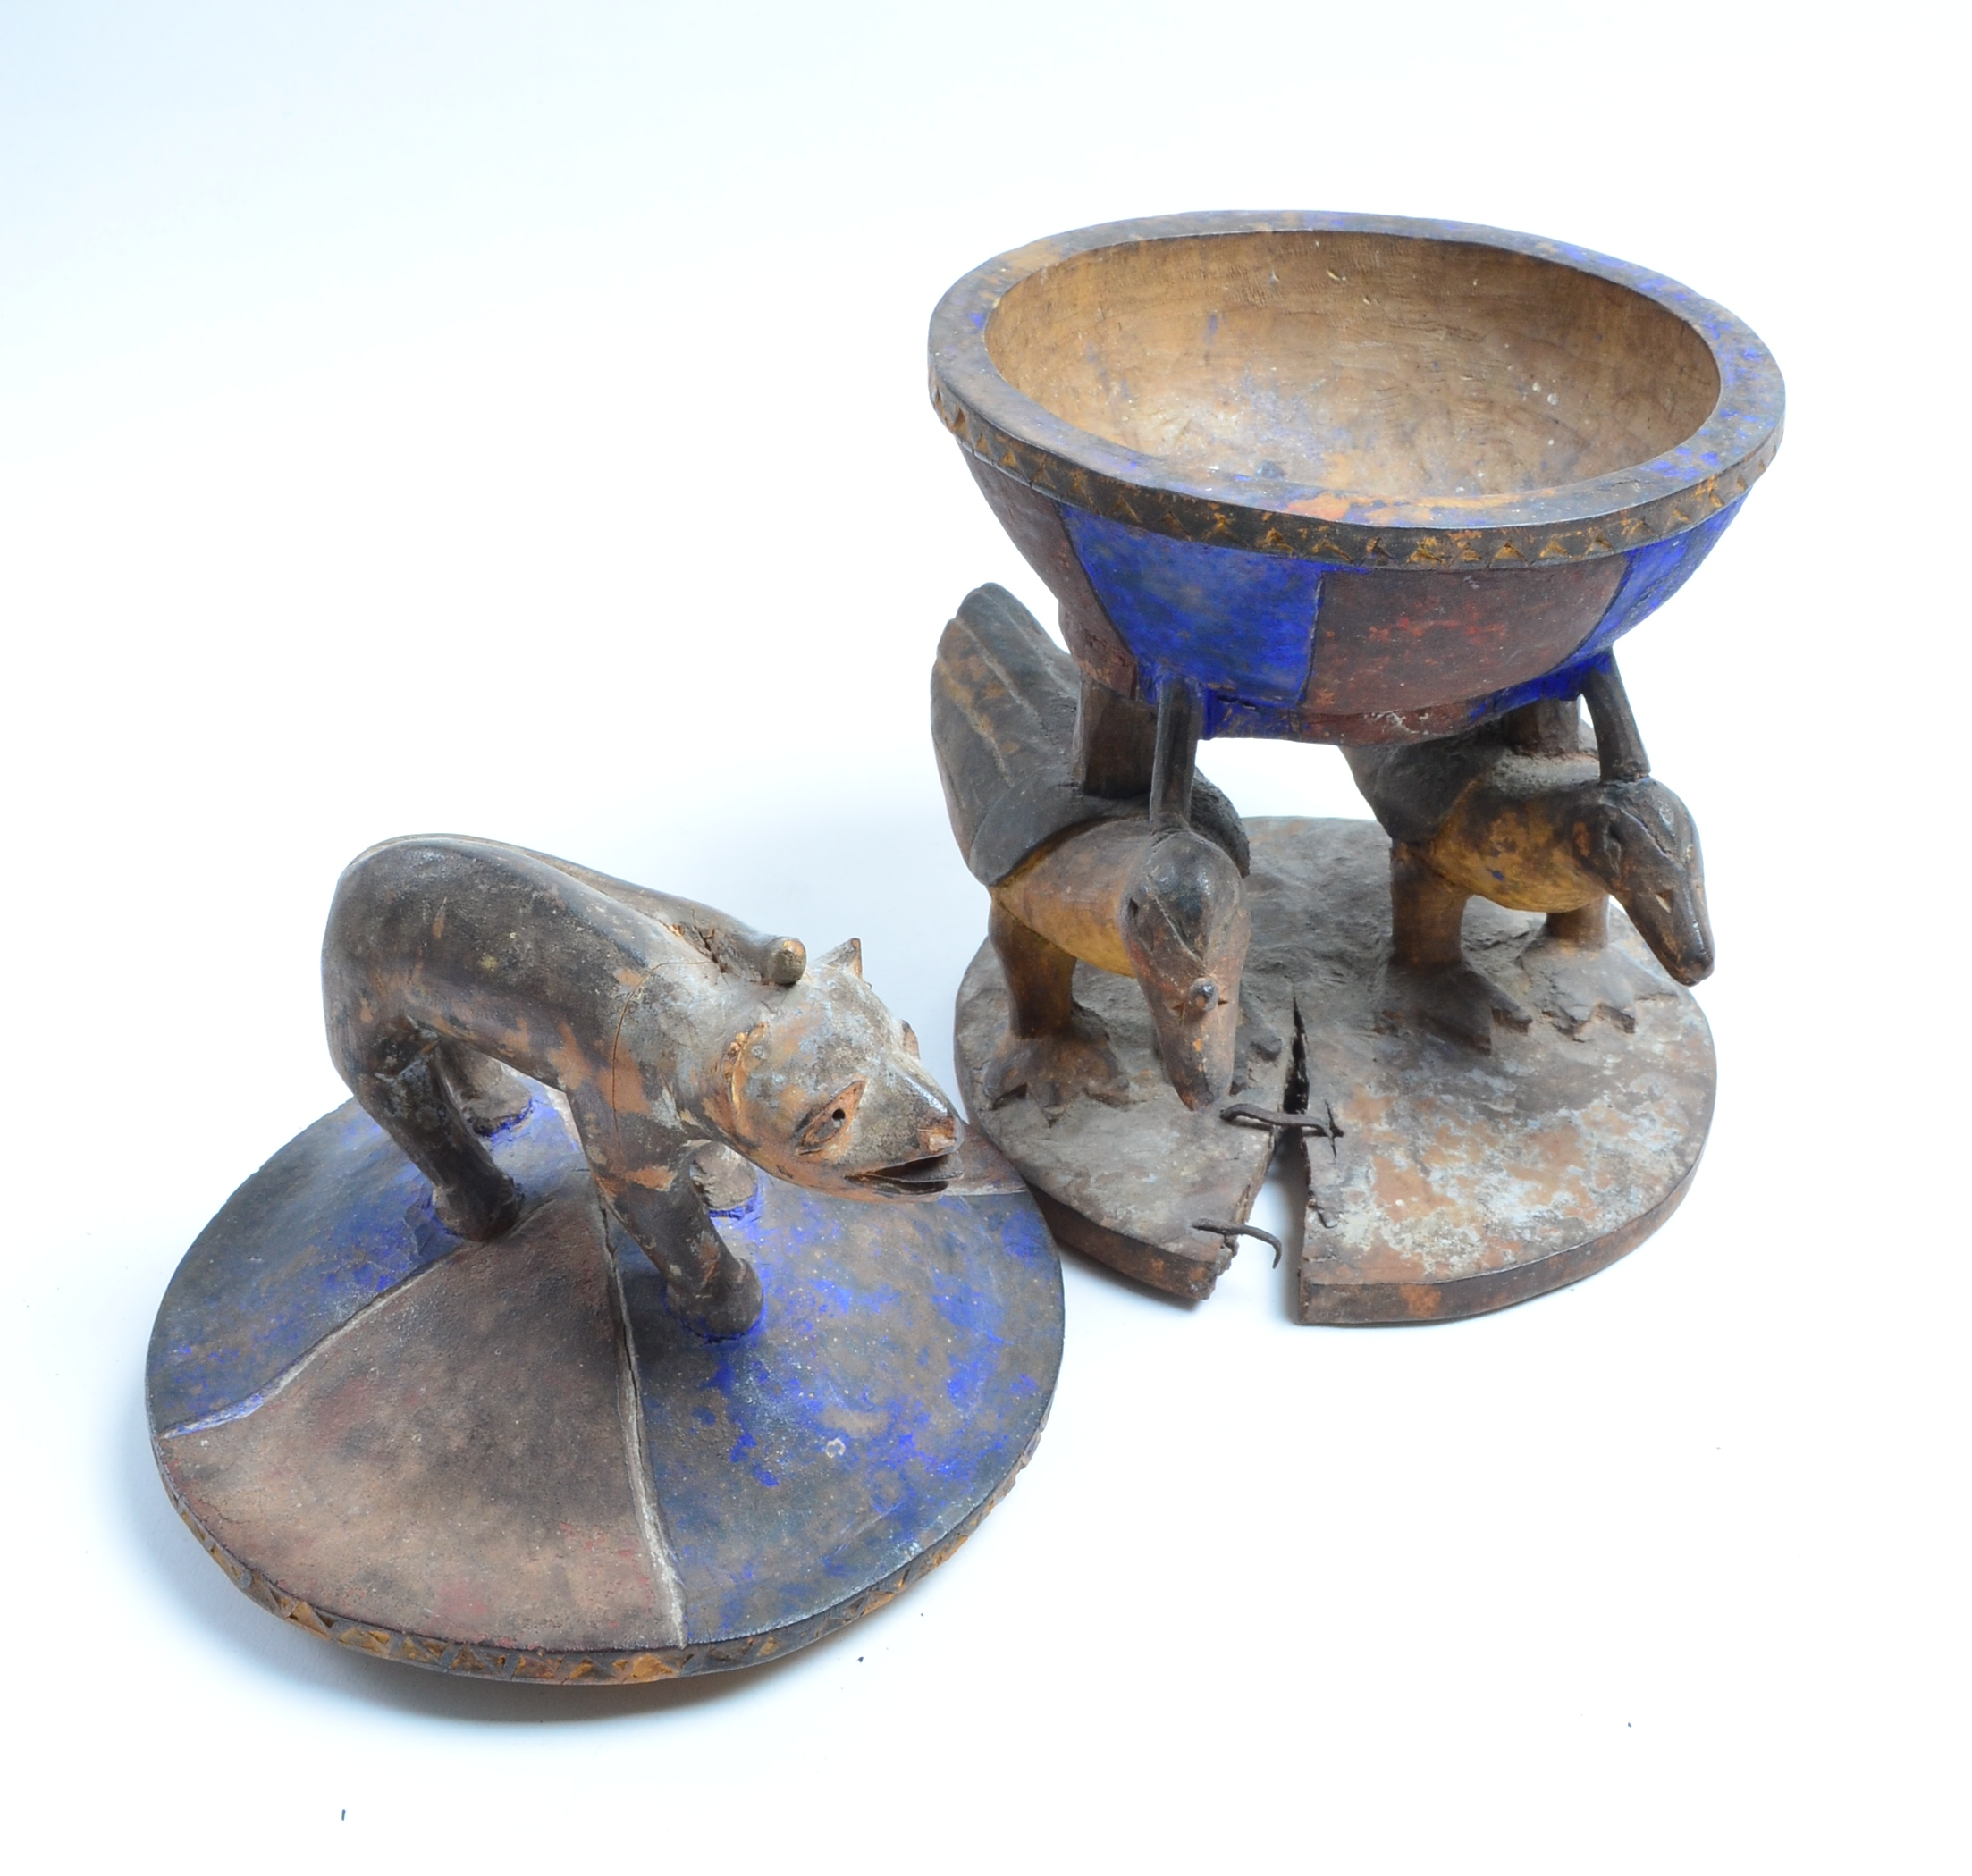 Divination cup